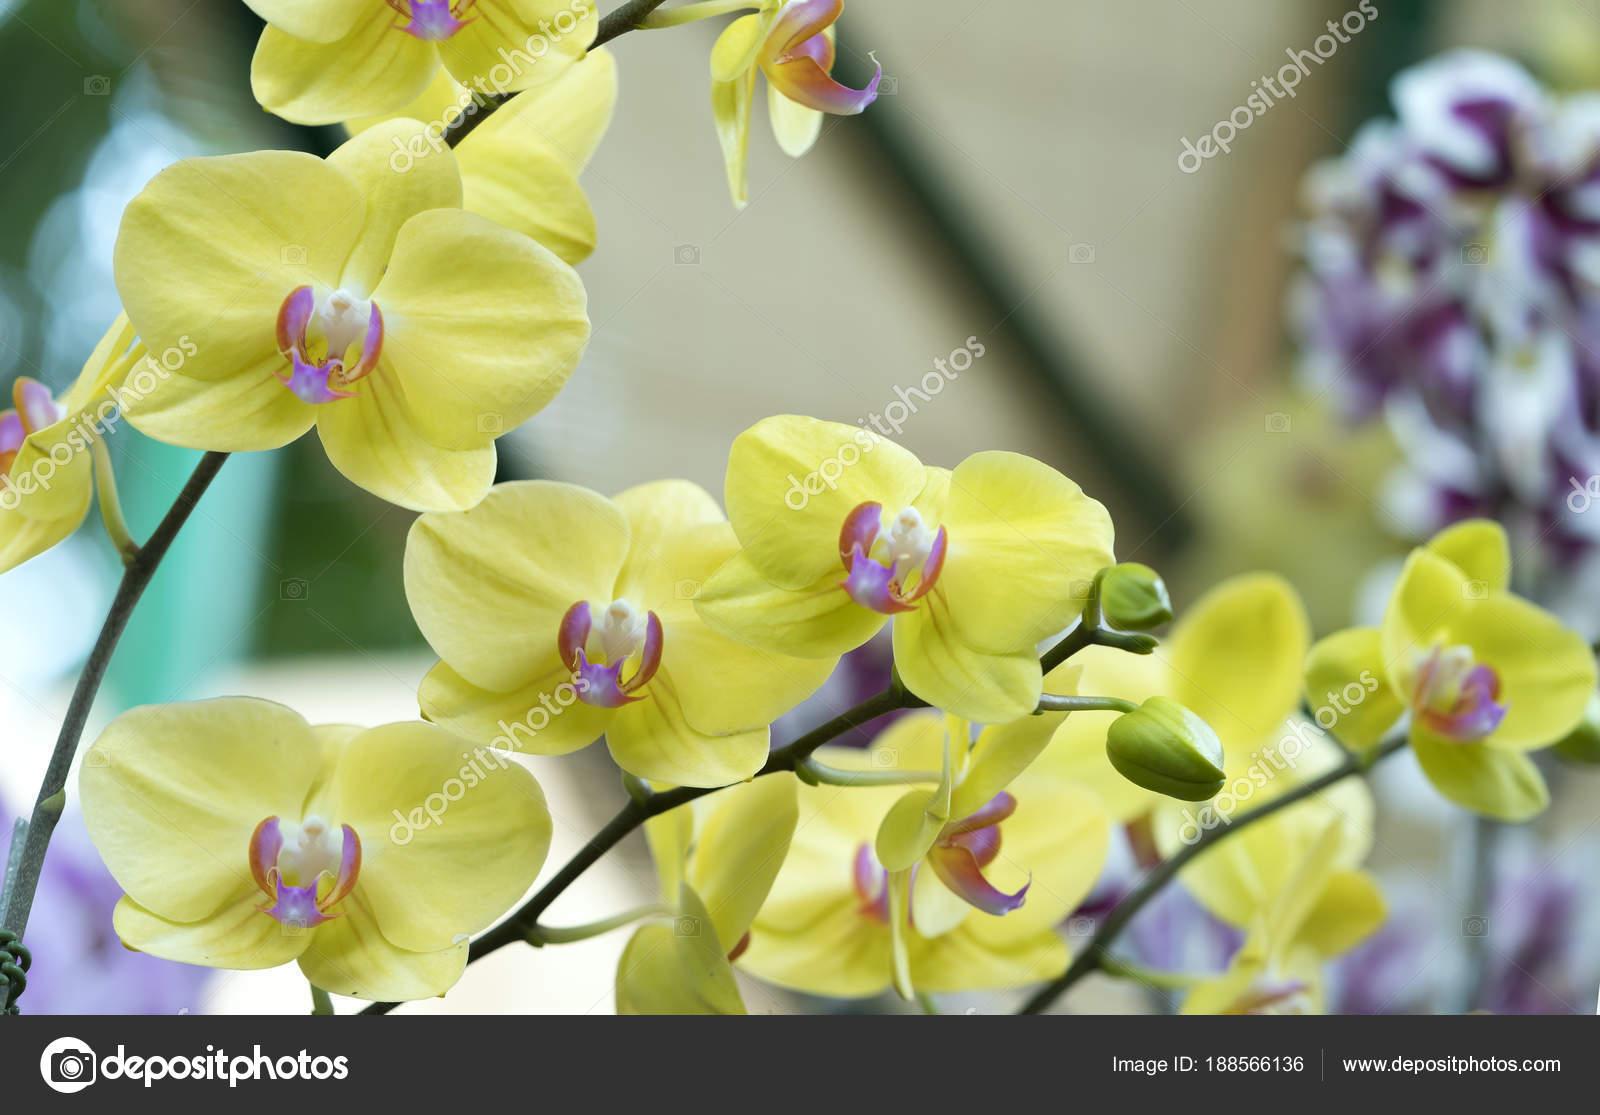 Phalaenopsis flowers bloom spring adorn beauty nature most beautiful phalaenopsis flowers bloom spring adorn beauty nature most beautiful orchid stock photo mightylinksfo